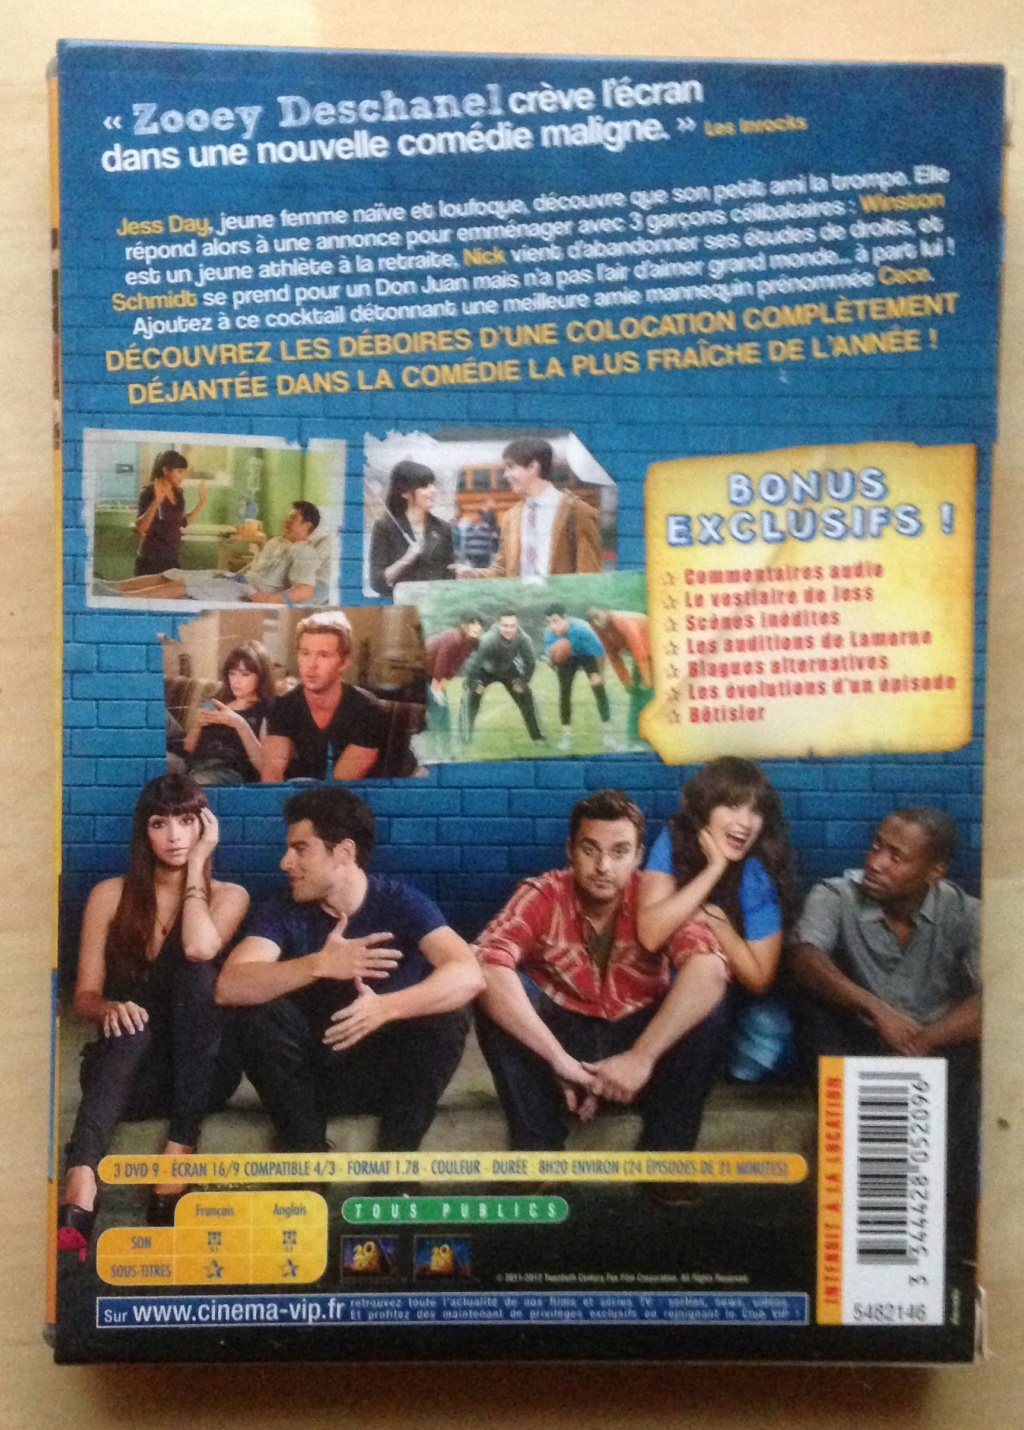 [DON/ECH] Le gros foutoir DVD [MAJ 10/05] - Page 6 Img_0626